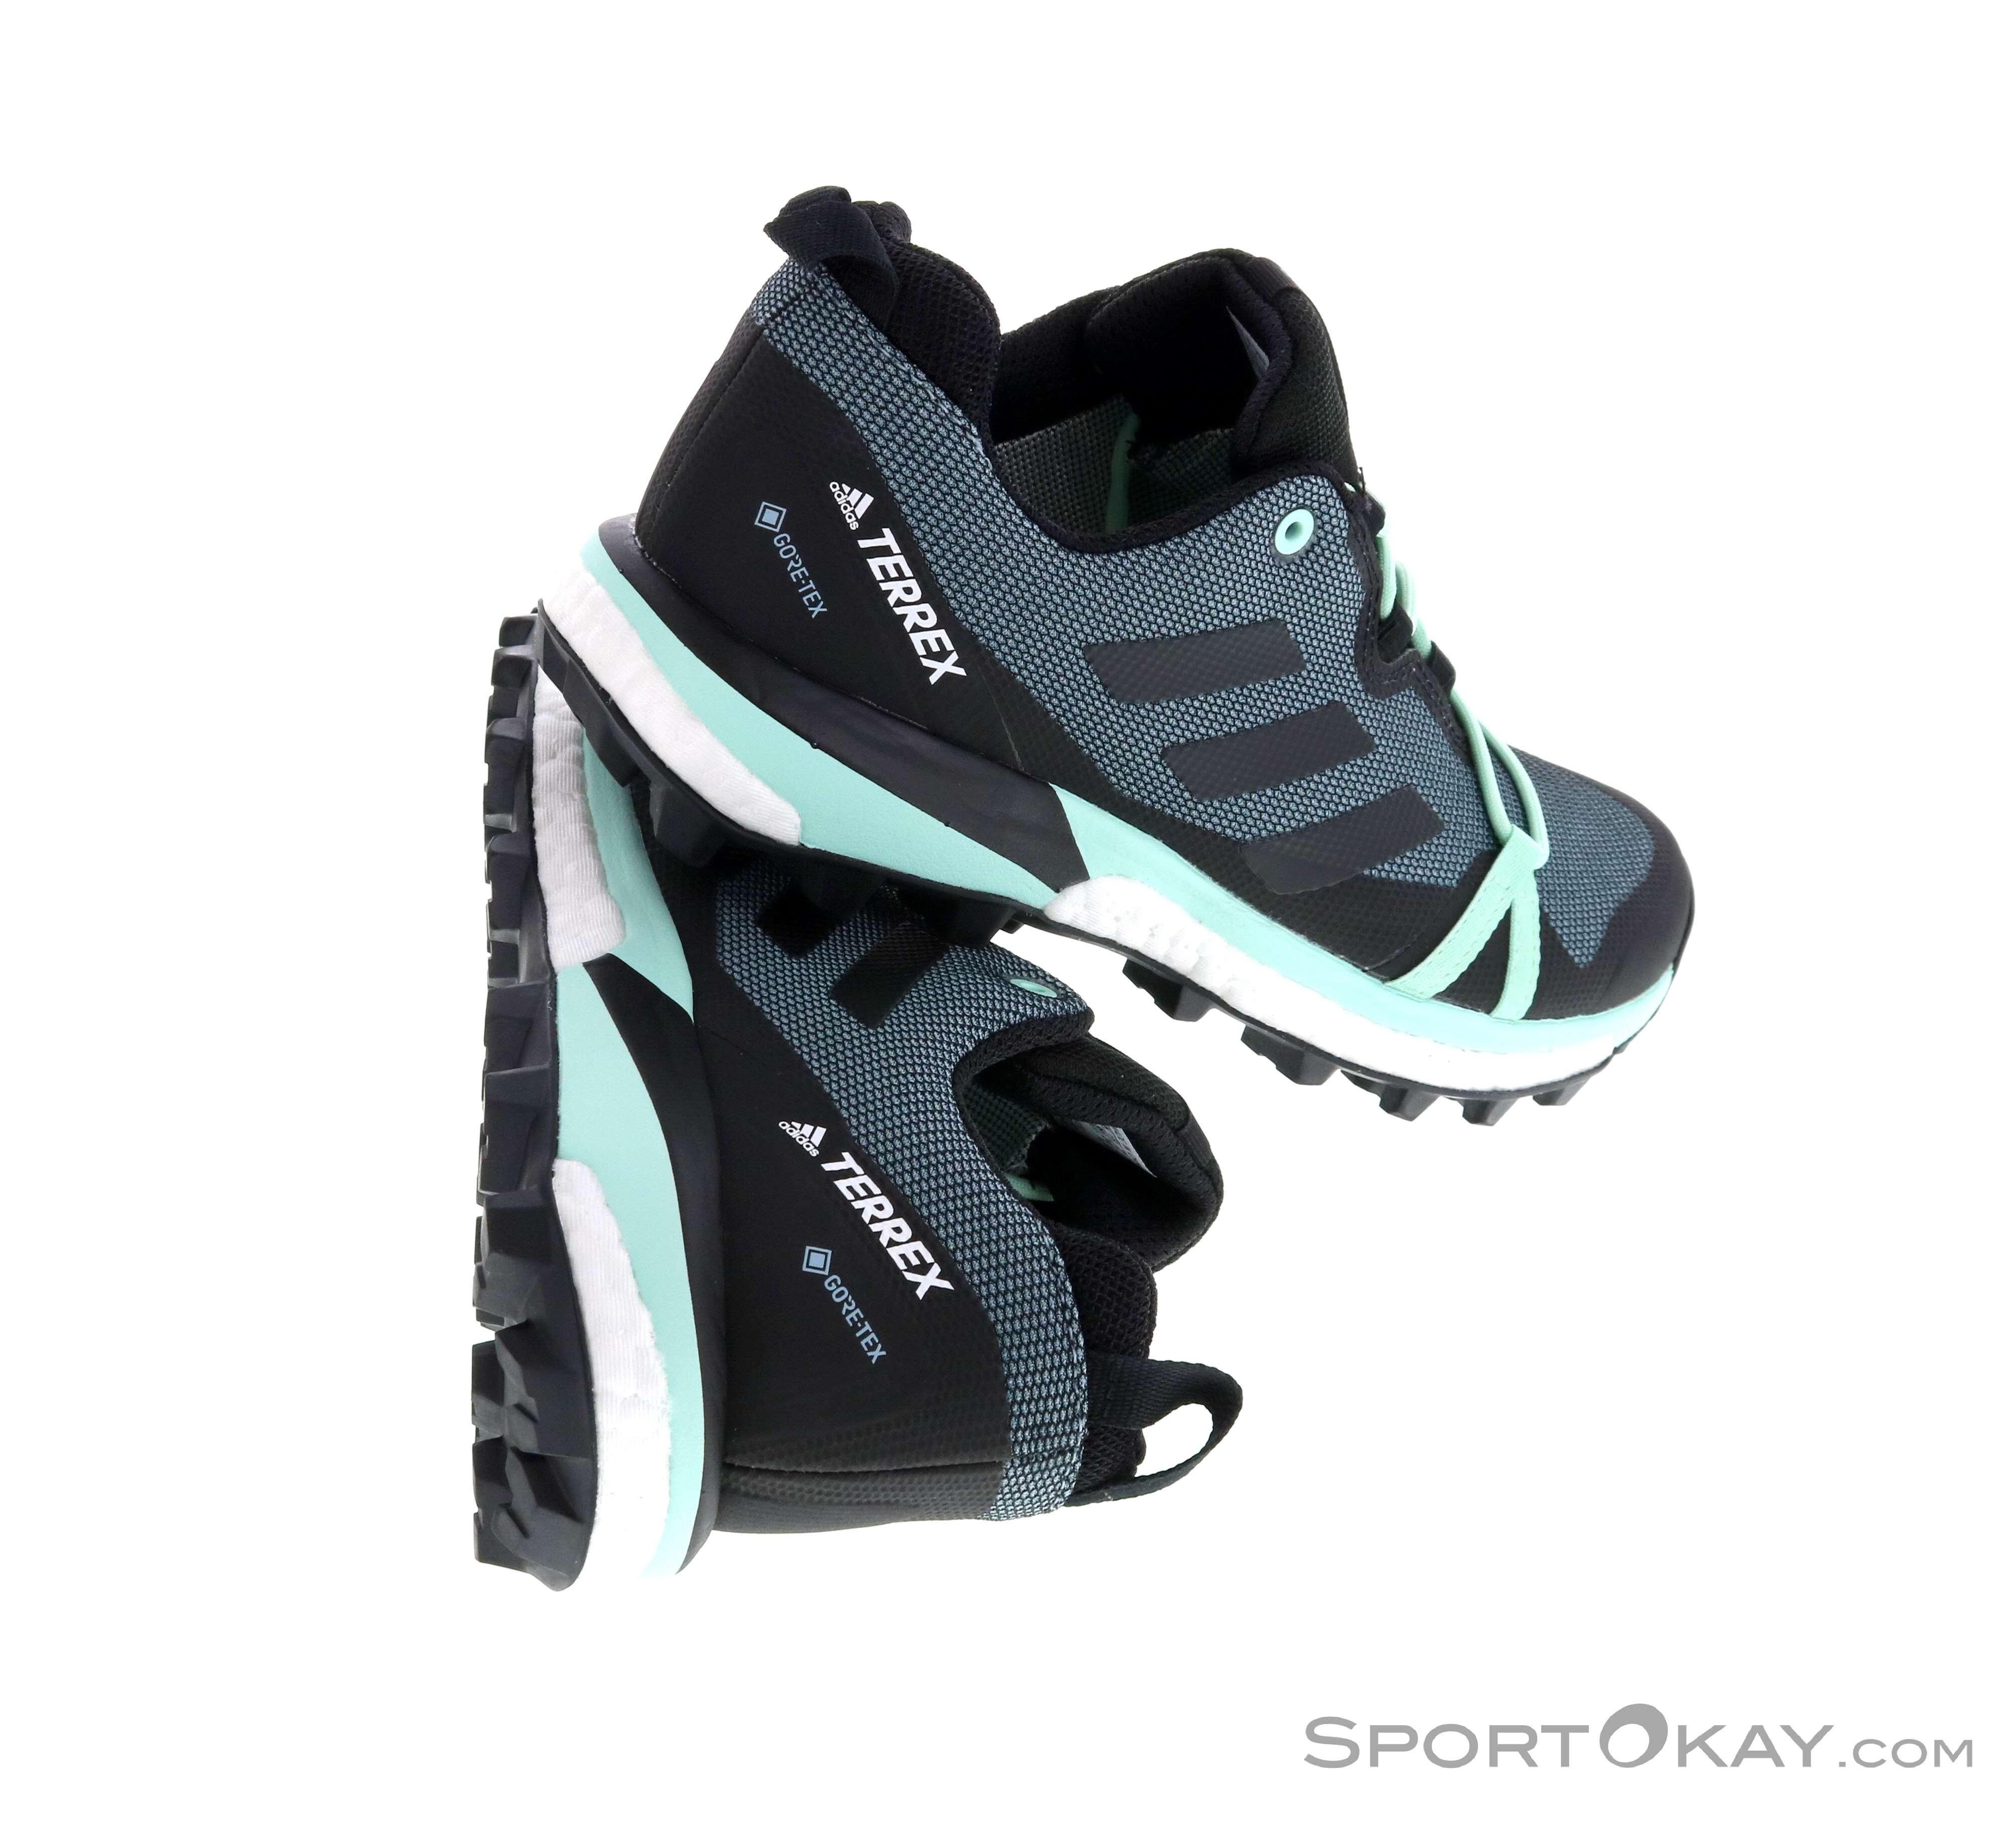 9b72c9b3d adidas Terrex Skychaser LT Womens Trekking Shoes Gore-Tex - Trekking ...